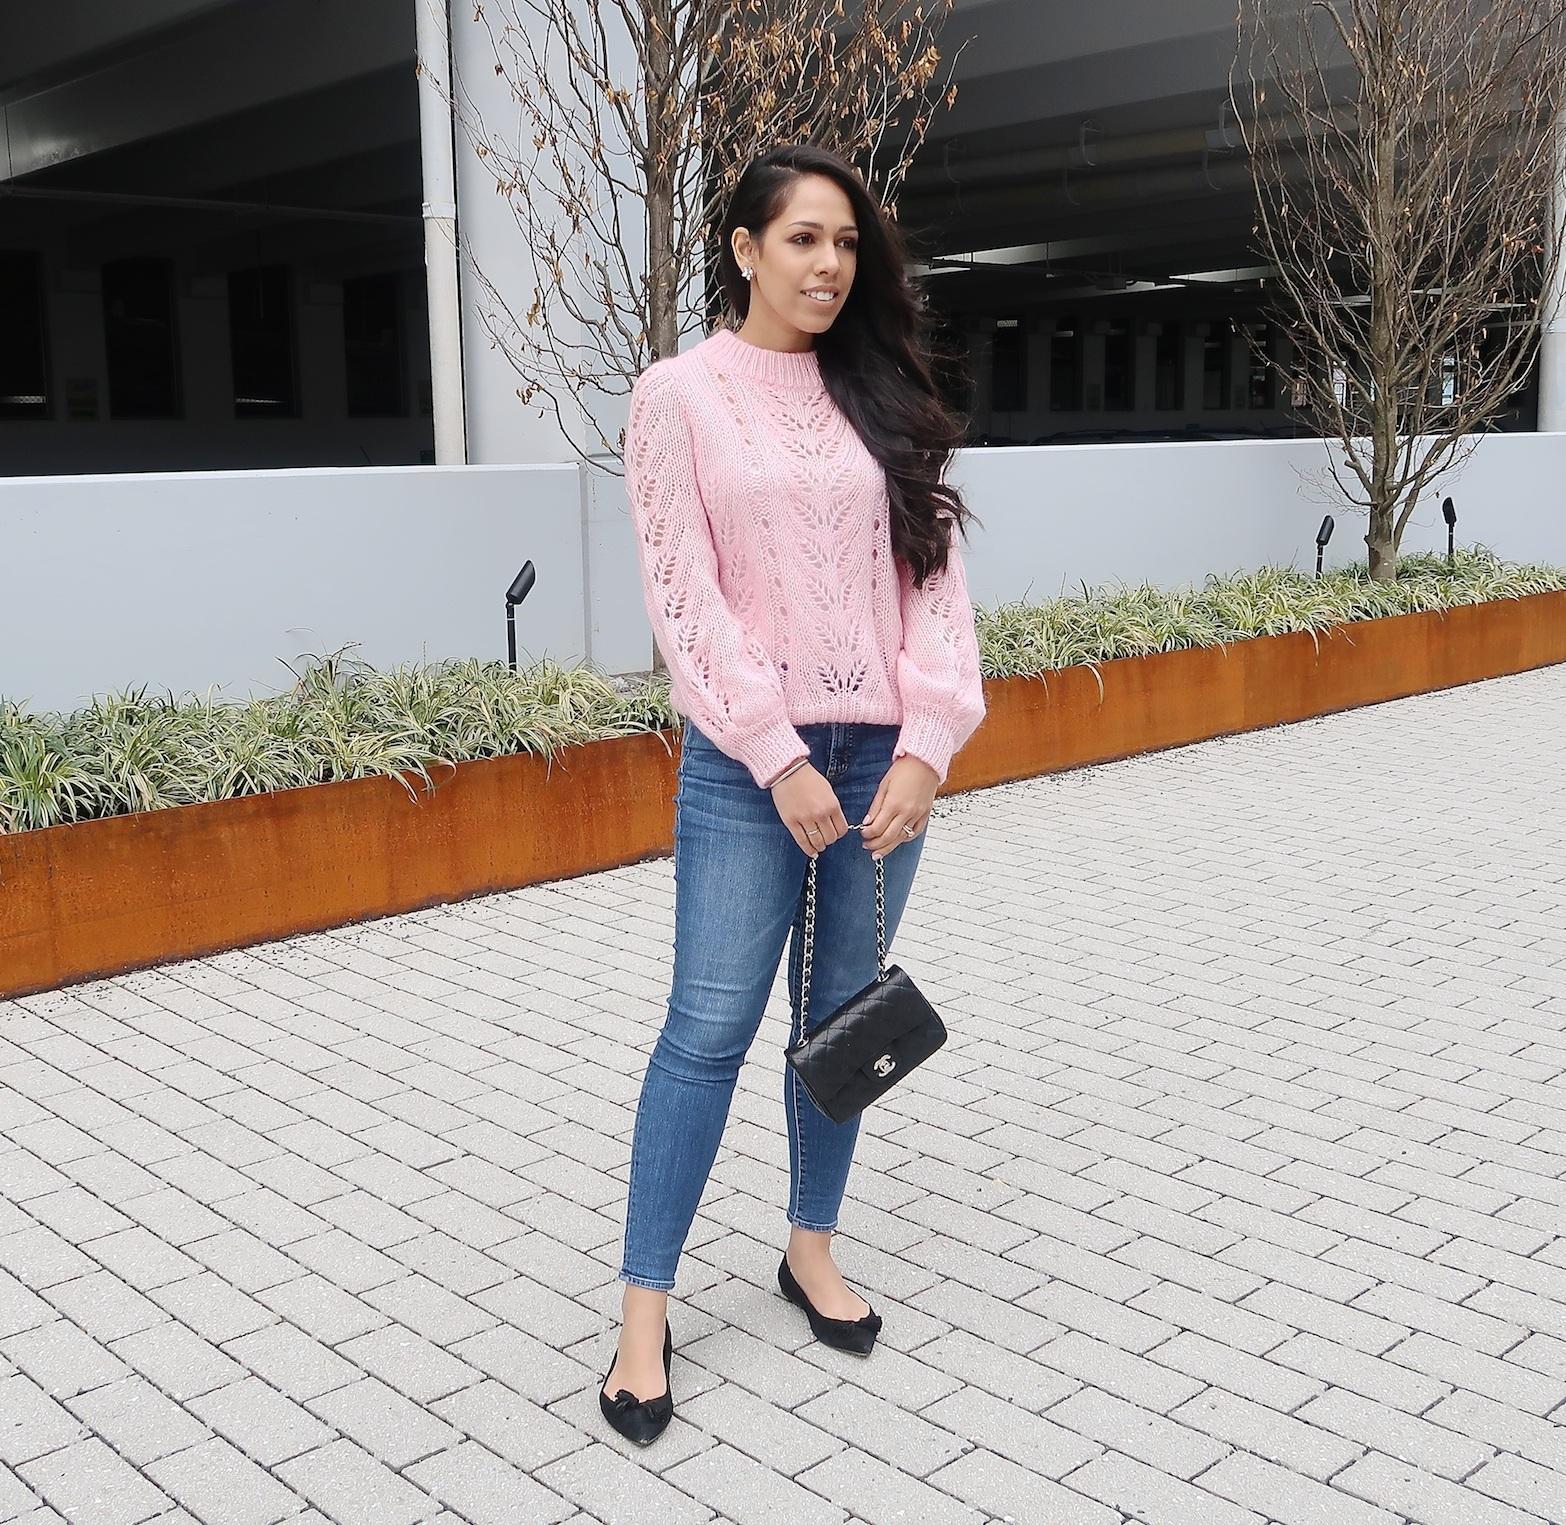 how-to-transition-wardrobe-season-fashion-blog.jpg